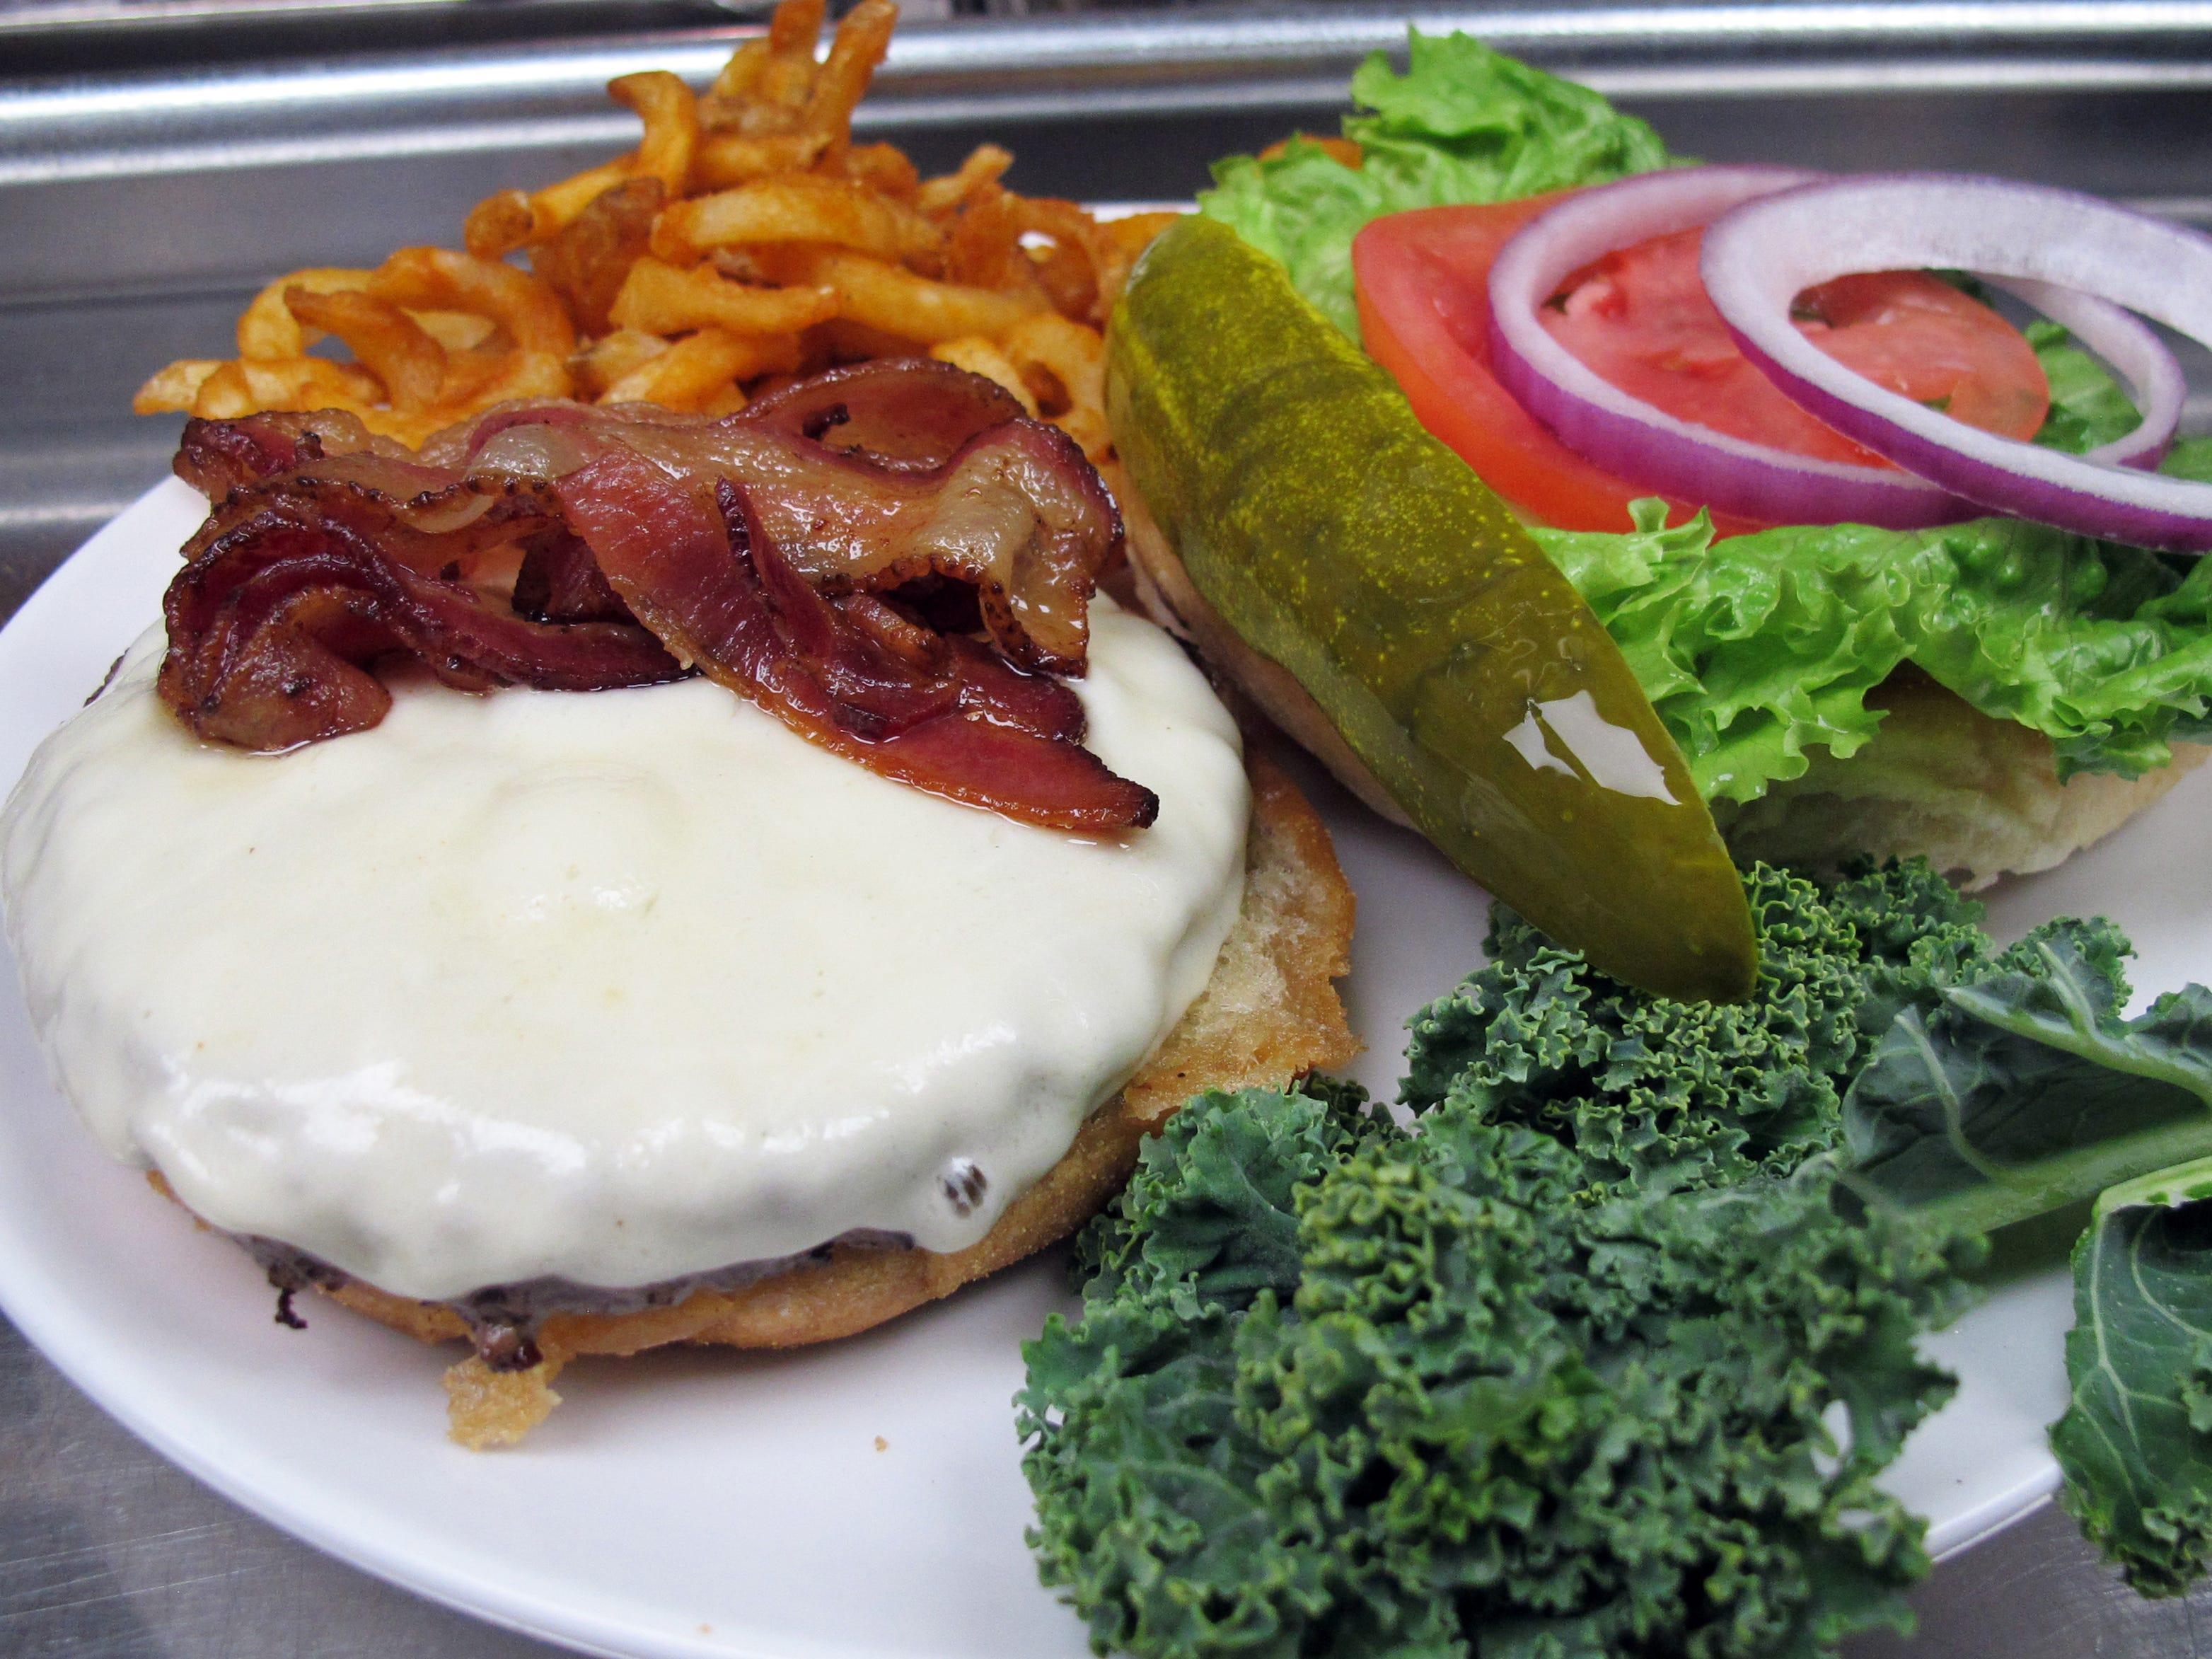 The Balloon Burger with bacon and cheese at the Bonita Beach Balloon Bar & Grill on Bonita Beach Road in Bonita Springs.